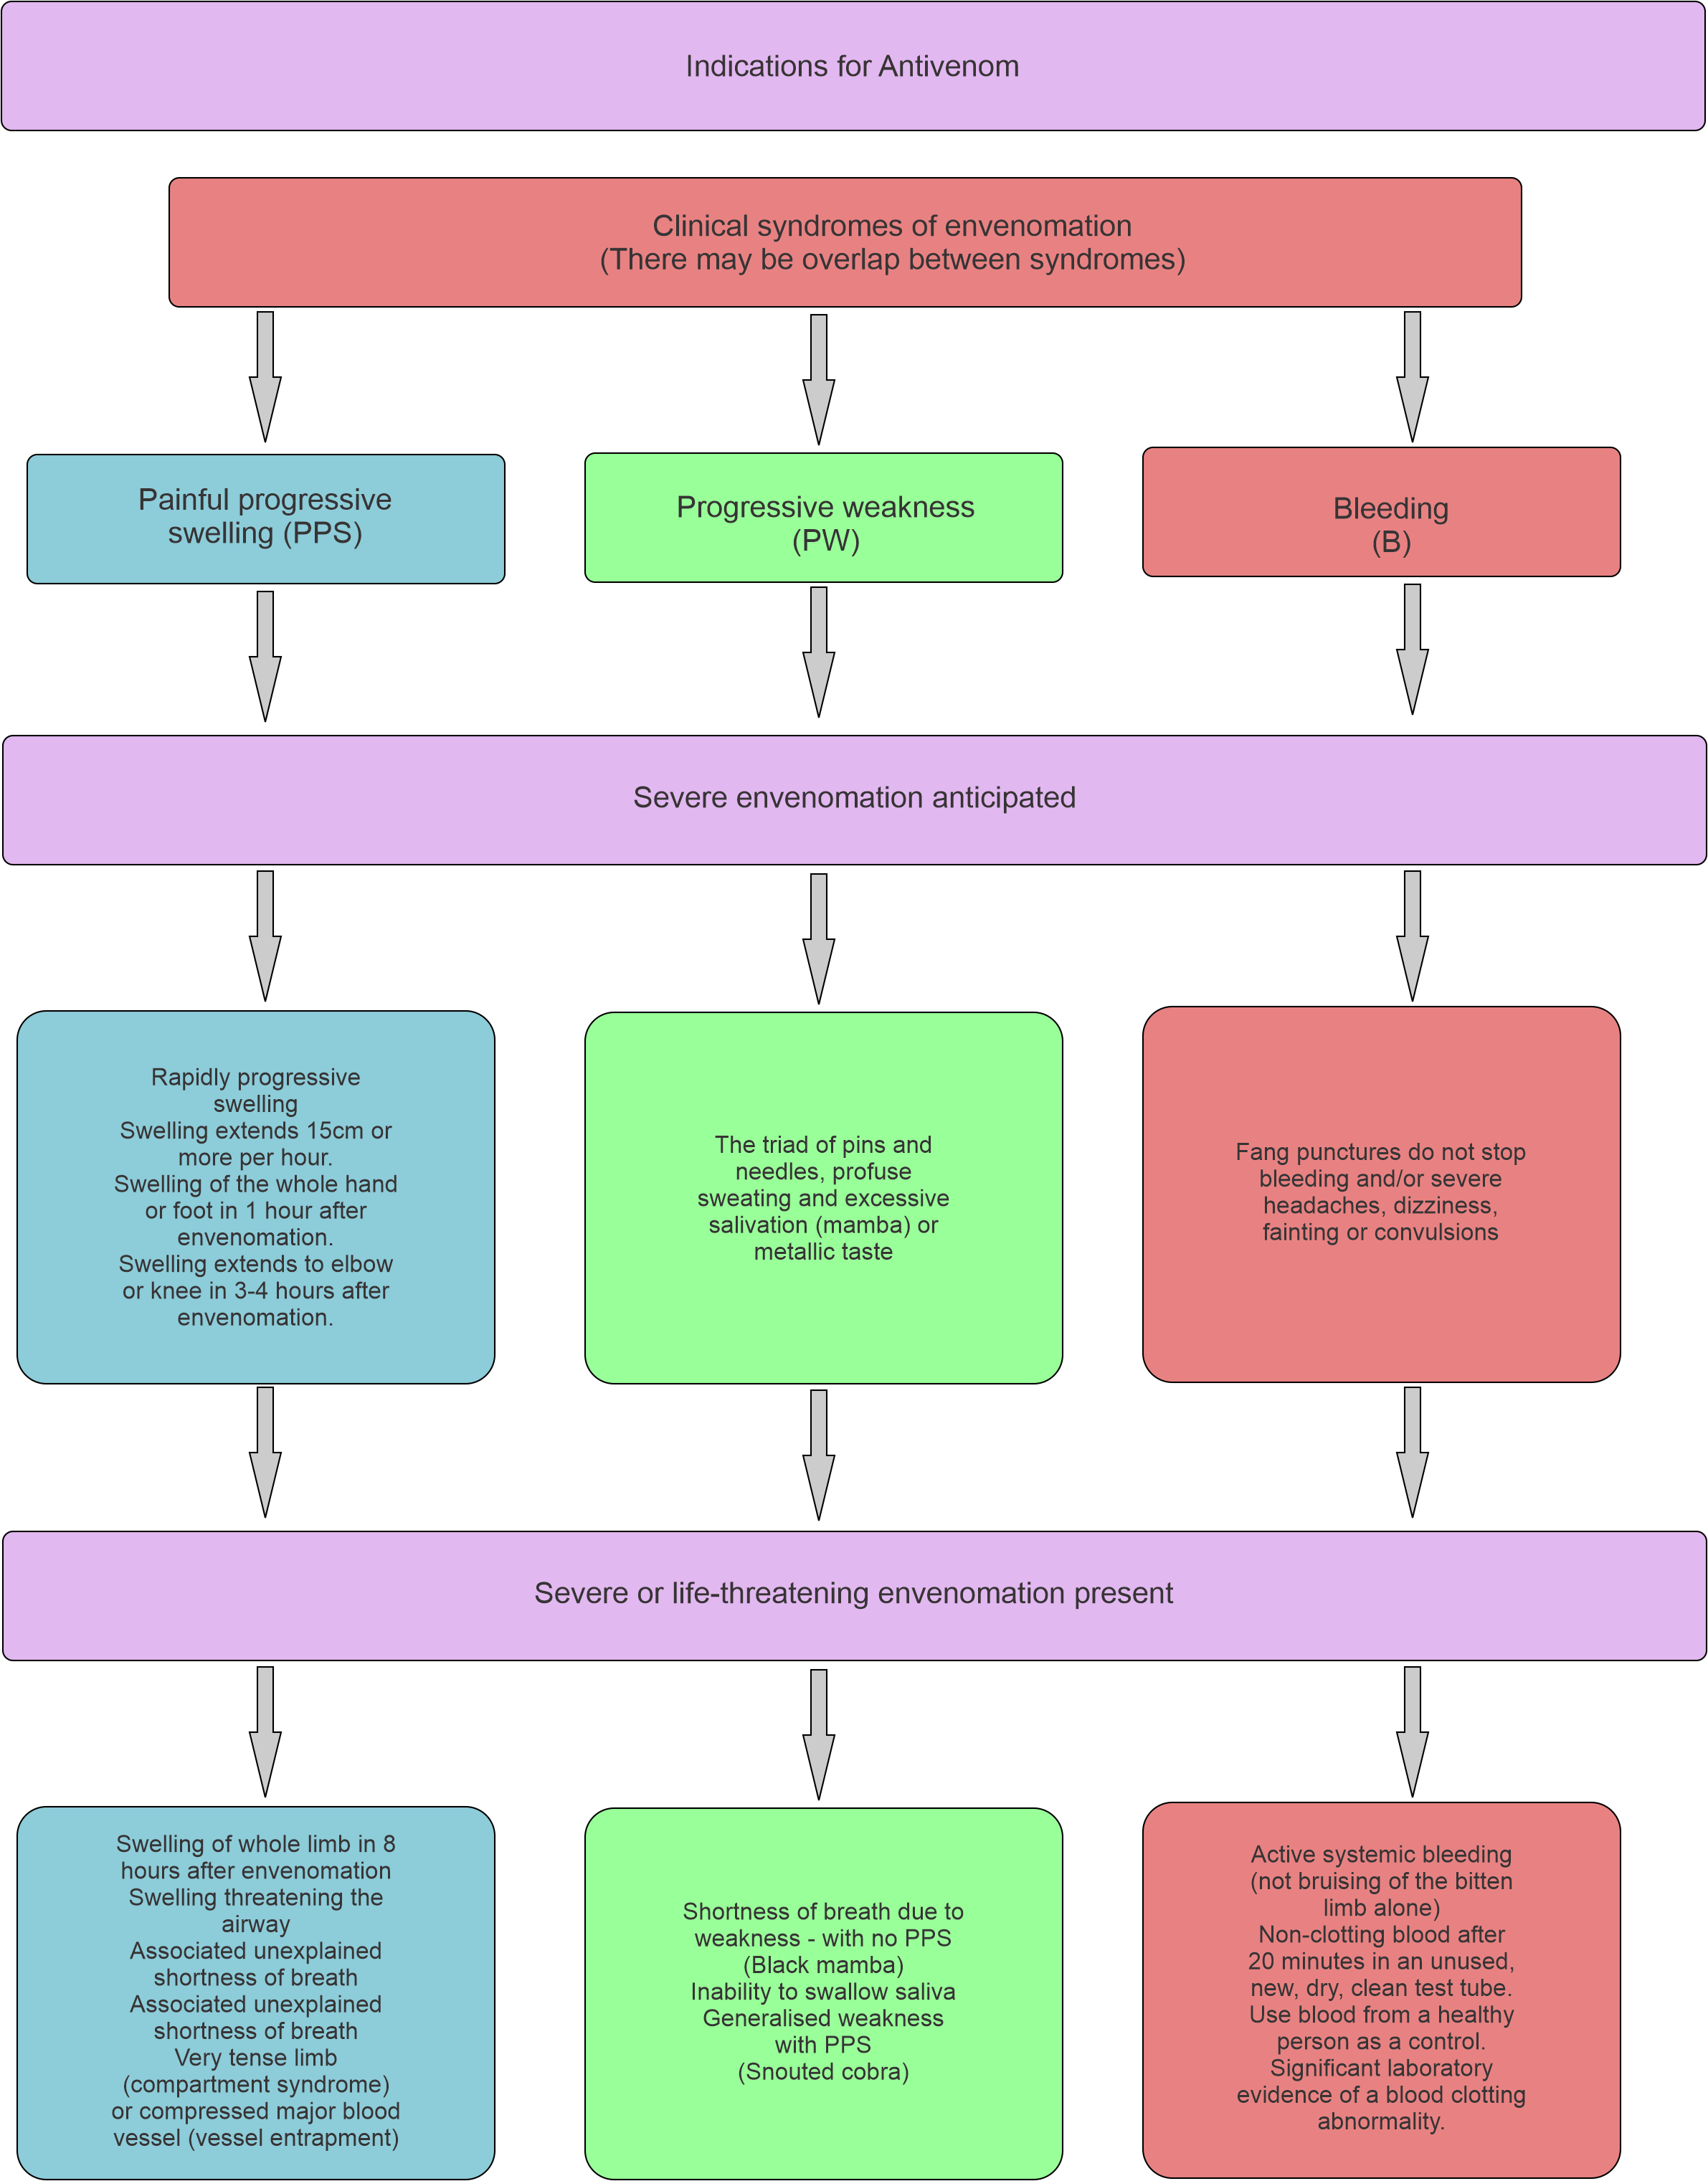 Indications for Antivenom